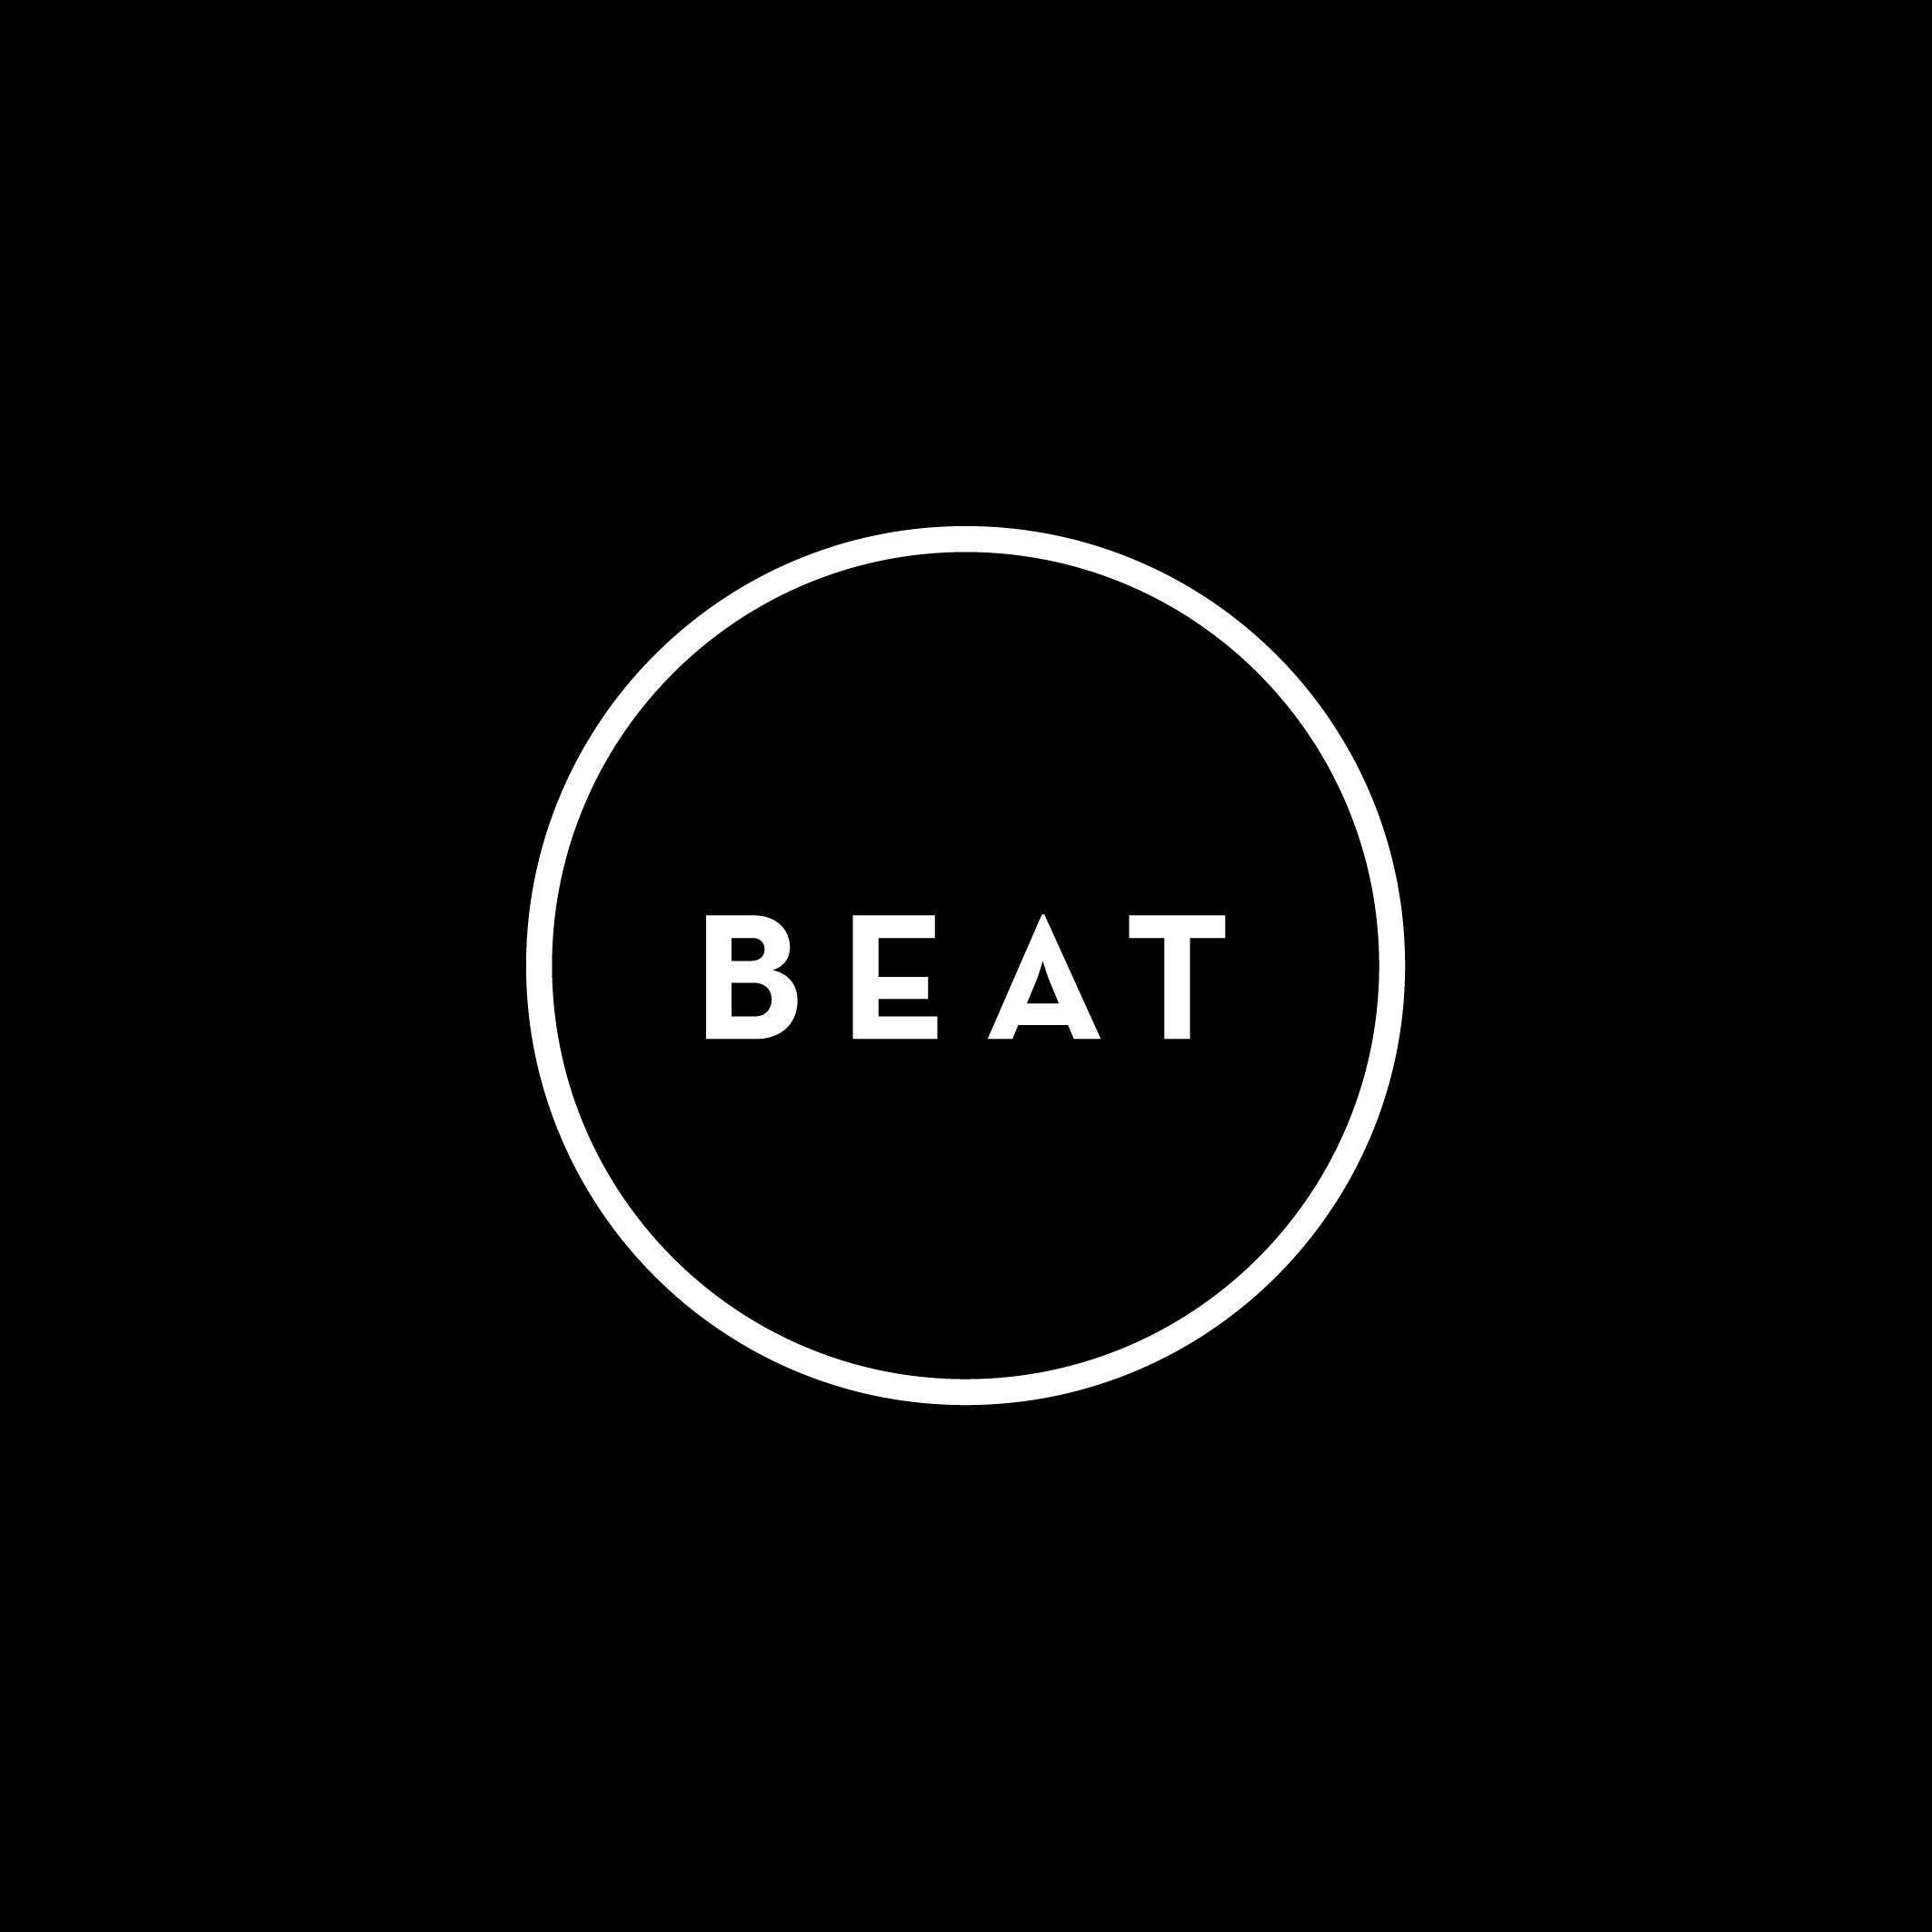 BeatLogo.jpg